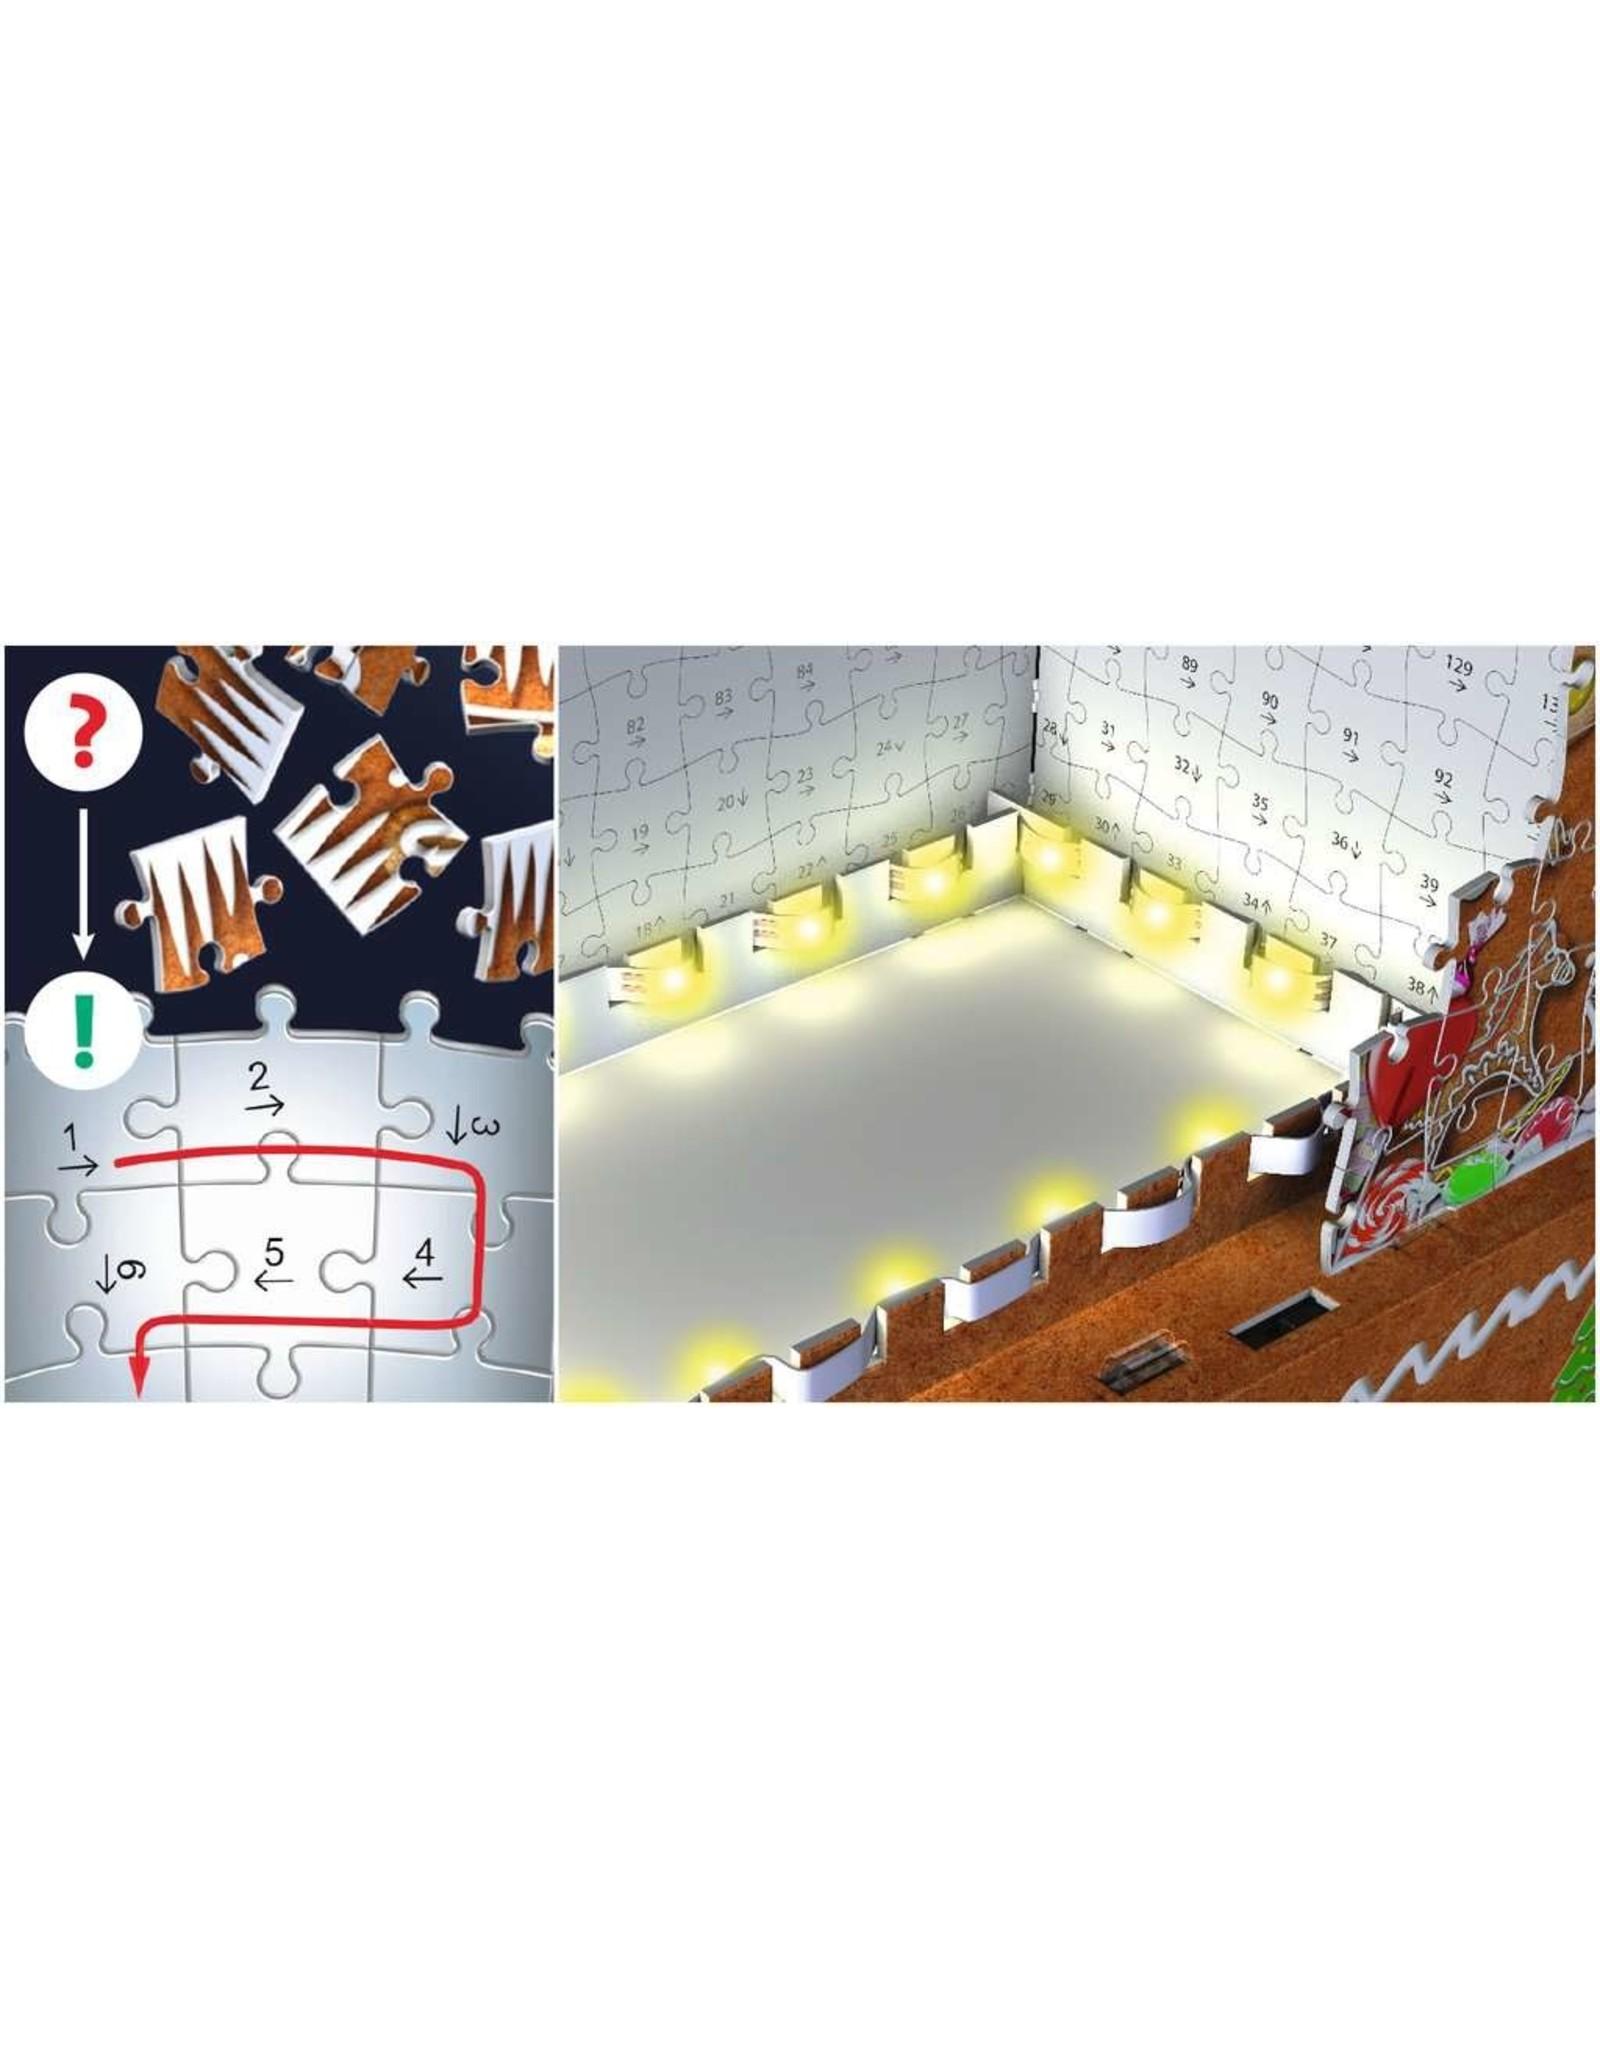 Ravensburger Gingerbread House 216pc 3D Puzzle